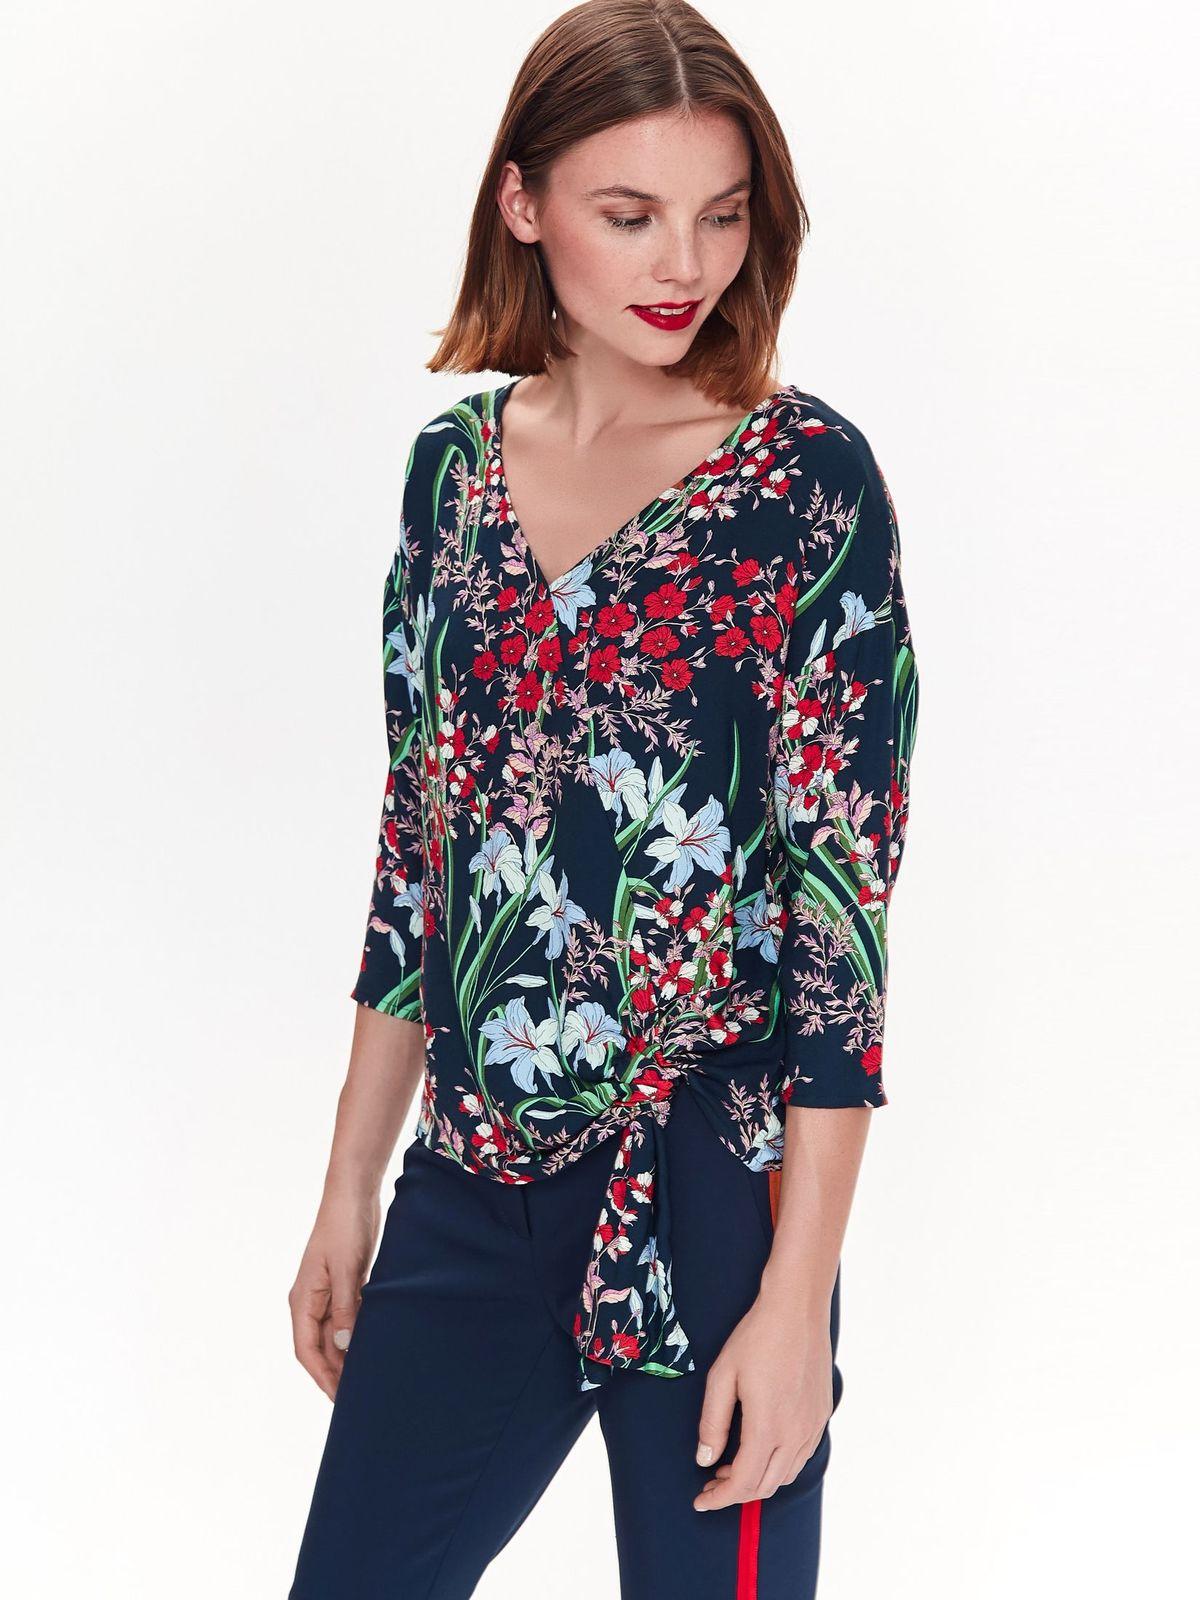 Top Secret darkblue flared women`s blouse nonelastic fabric with v-neckline